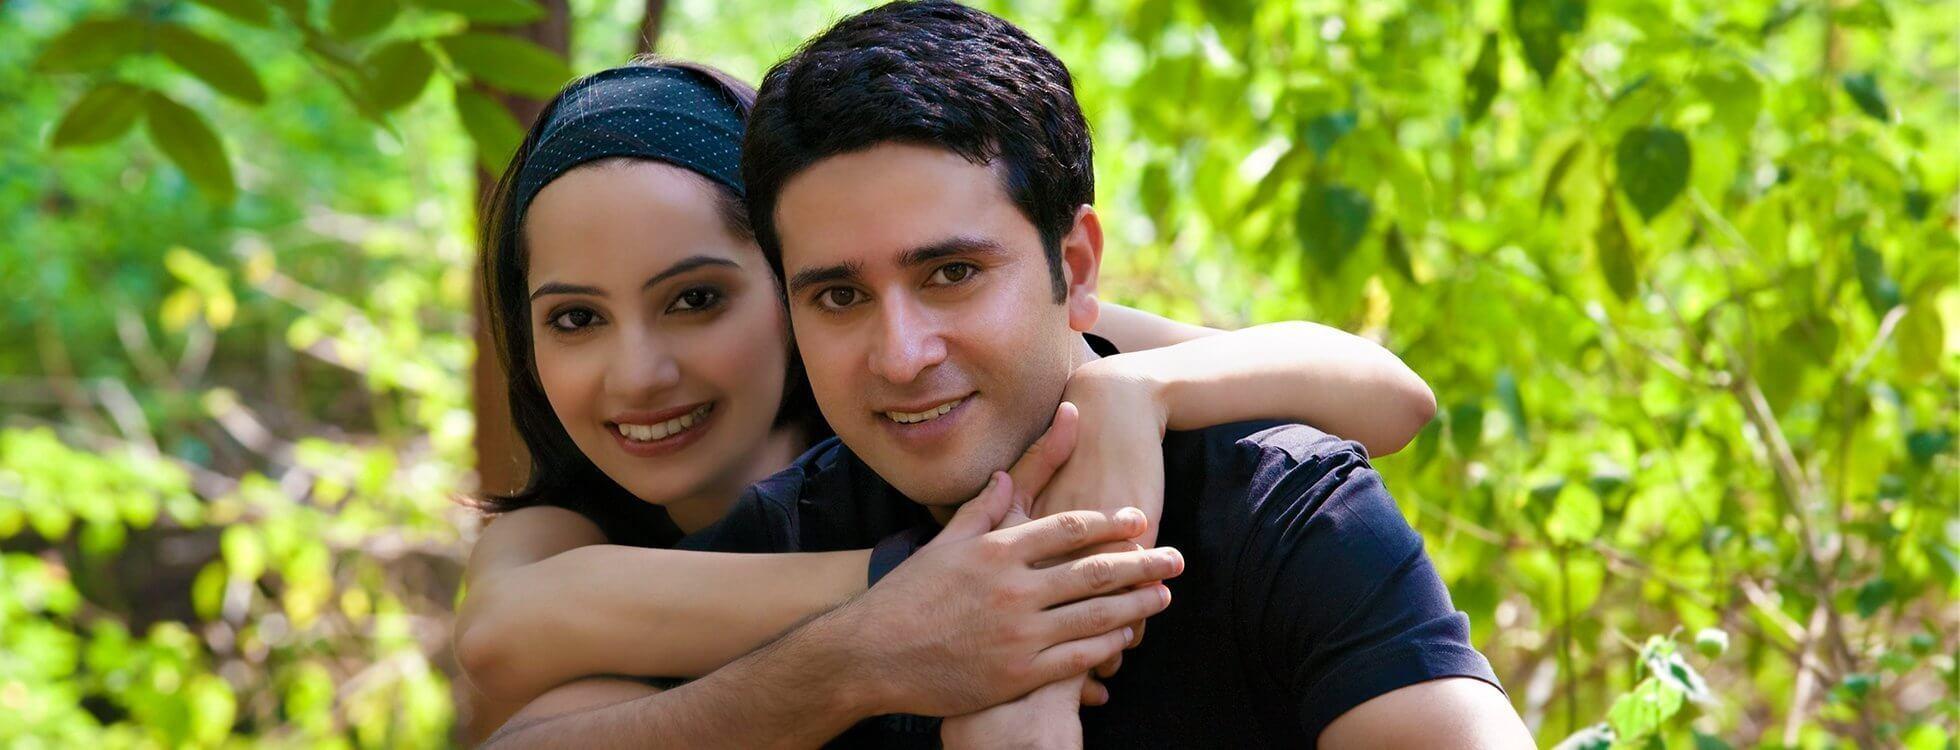 Gujarat Matrimony, Matrimonials, Bride, Groom